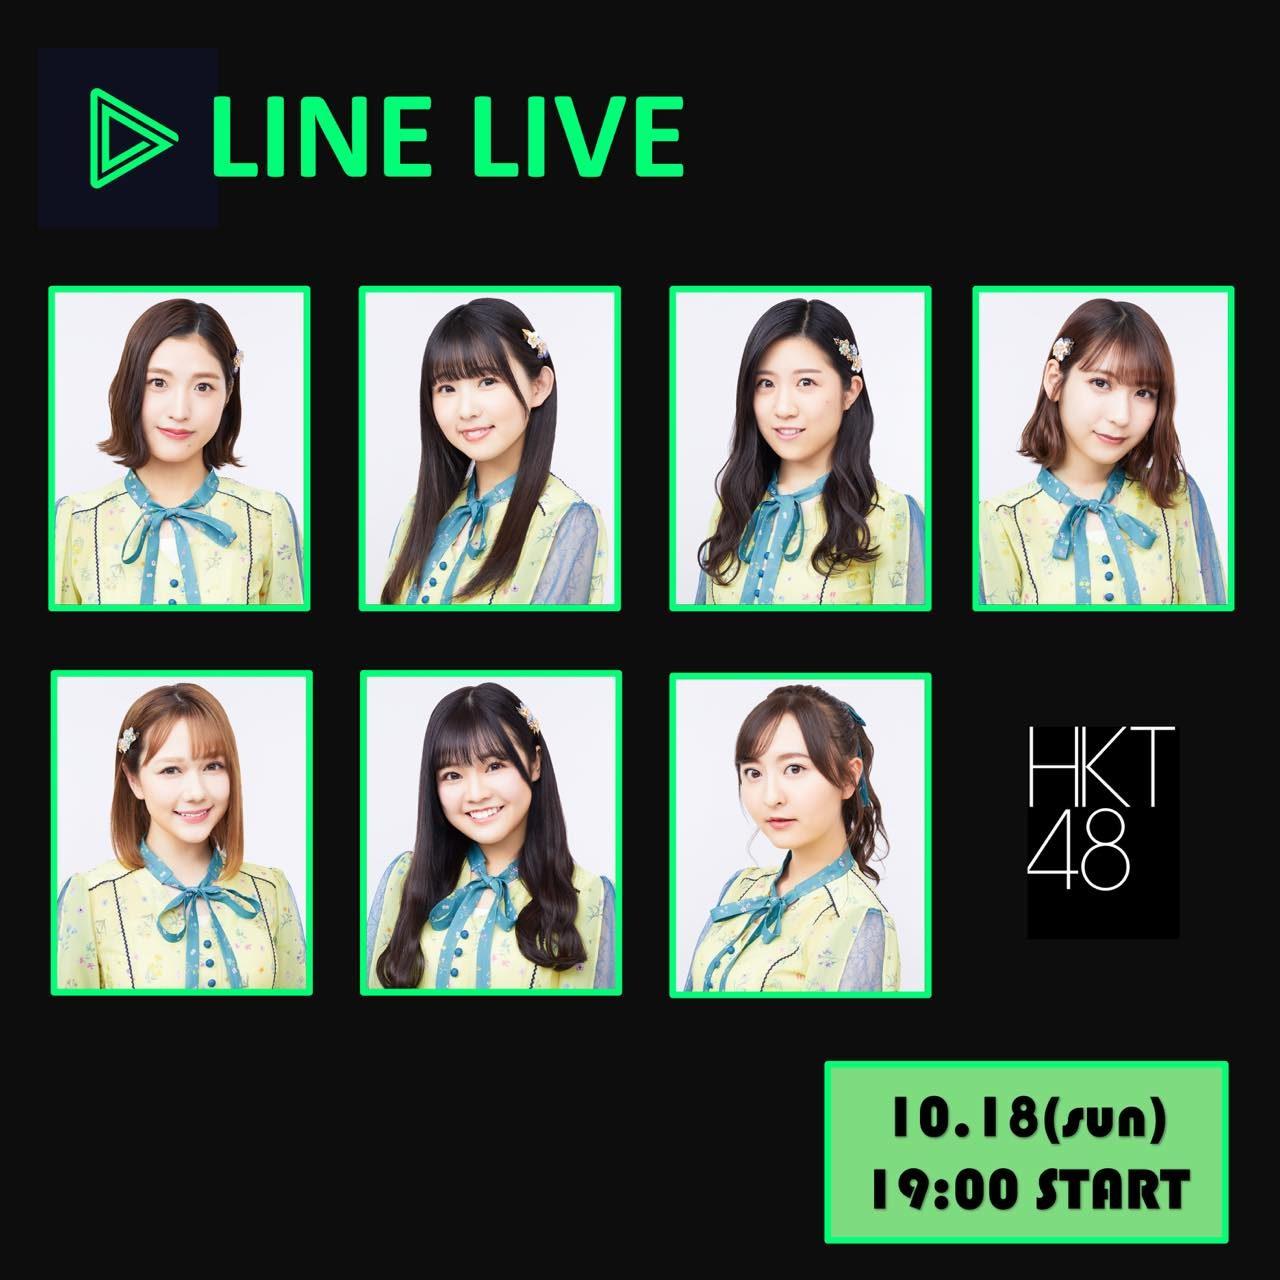 「HKT48 LINELIVE緊急生配信!!」今田美奈・熊沢世莉奈・下野由貴・松岡菜摘・村重杏奈・本村碧唯・森保まどかが19時から配信!